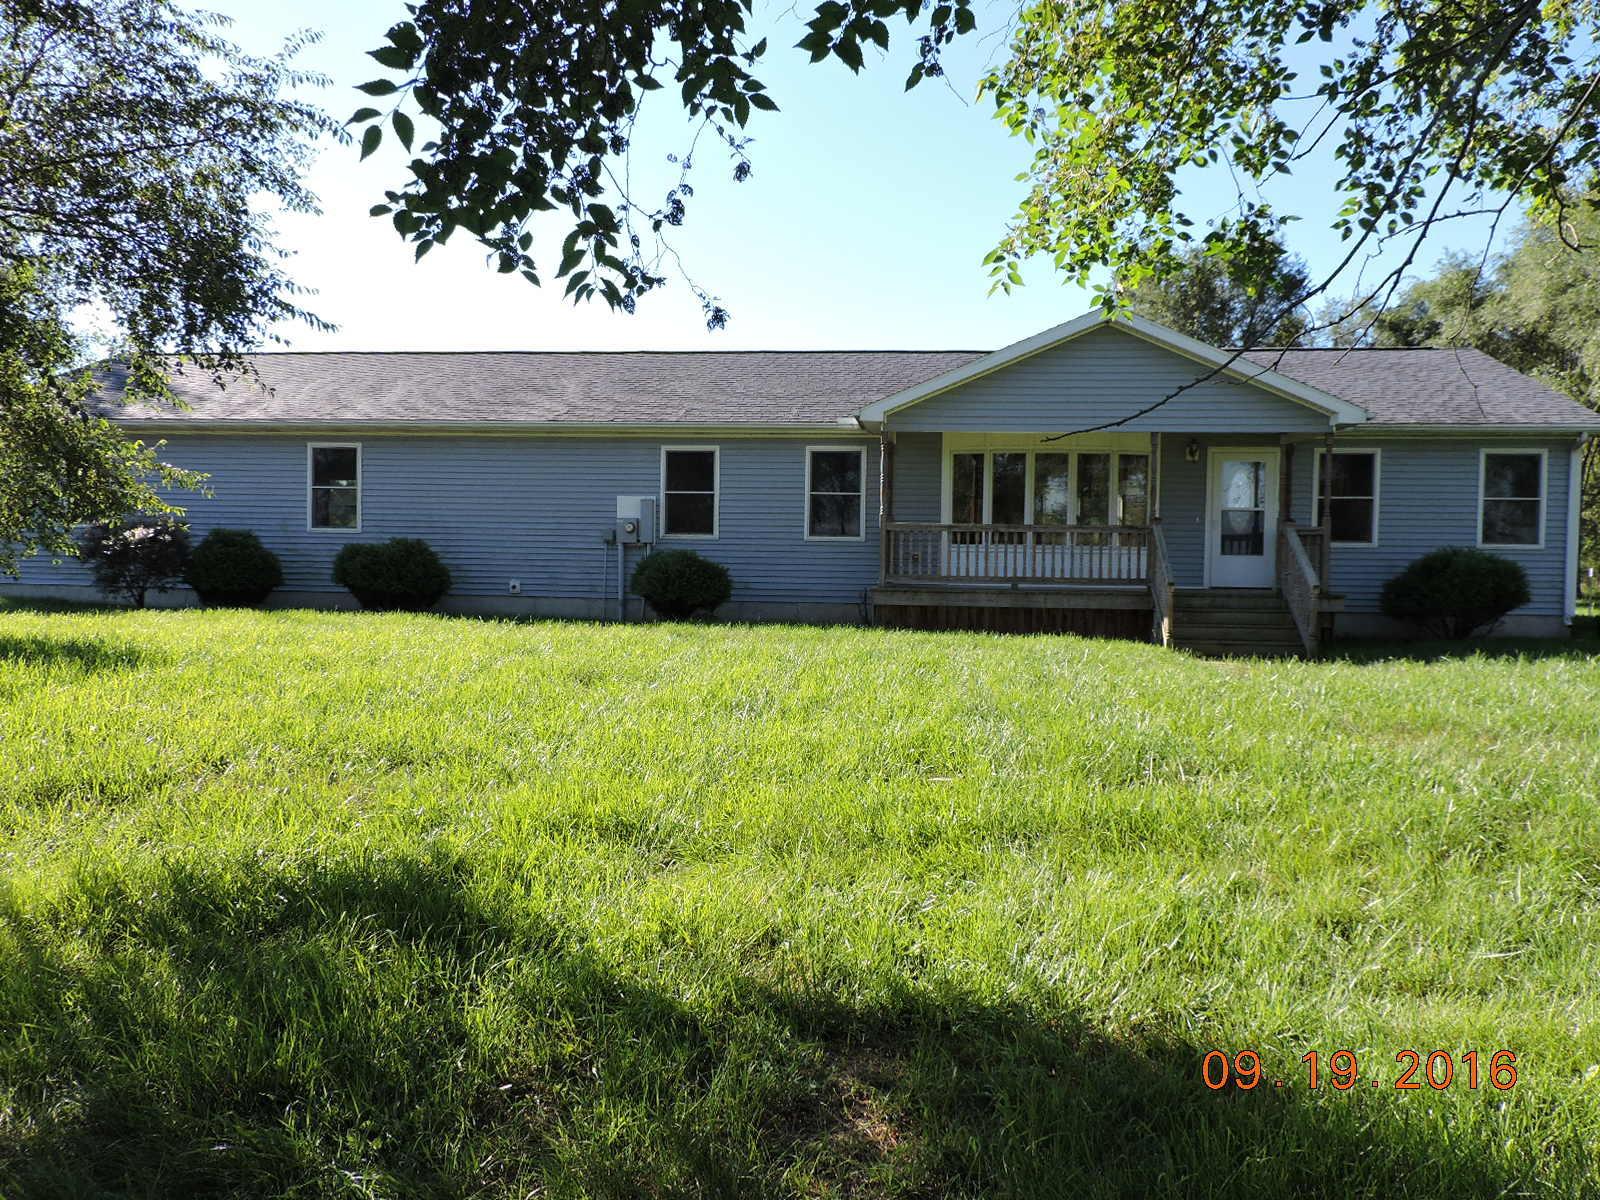 3341 W Gratiot County Line Rd - DSCN9451 - 1